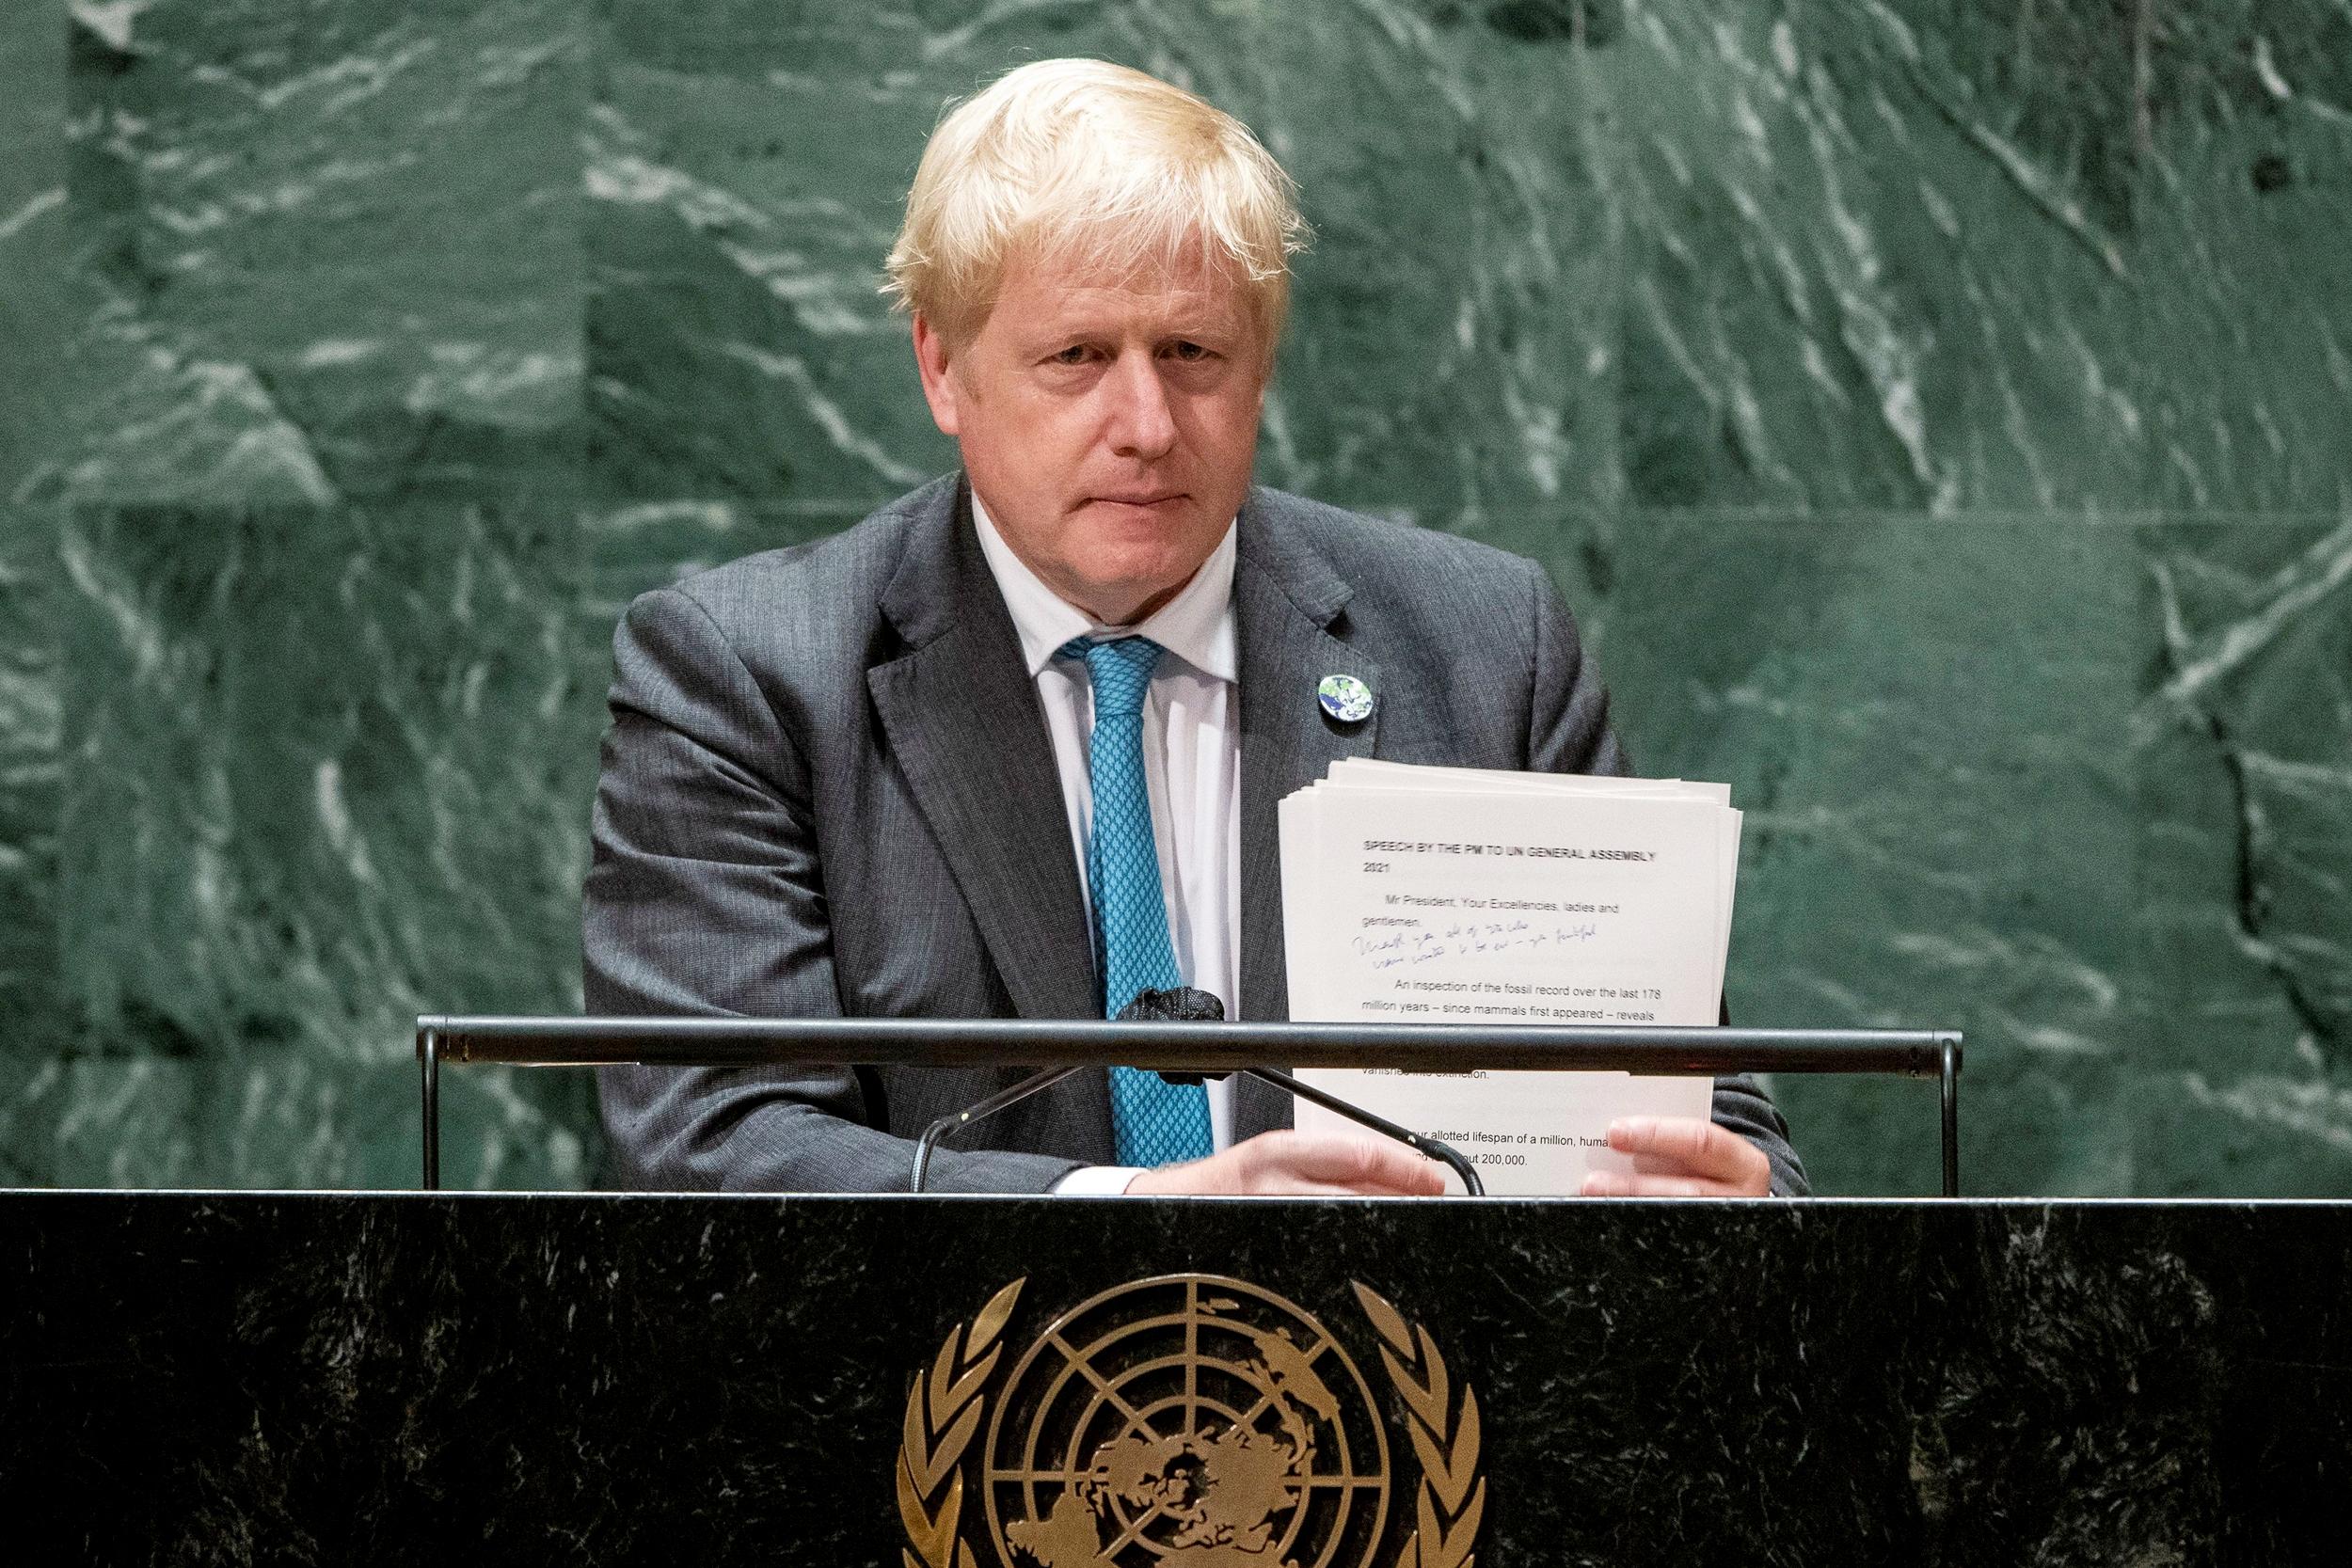 'Grow up': U.K.'s Boris Johnson says world must face climate change